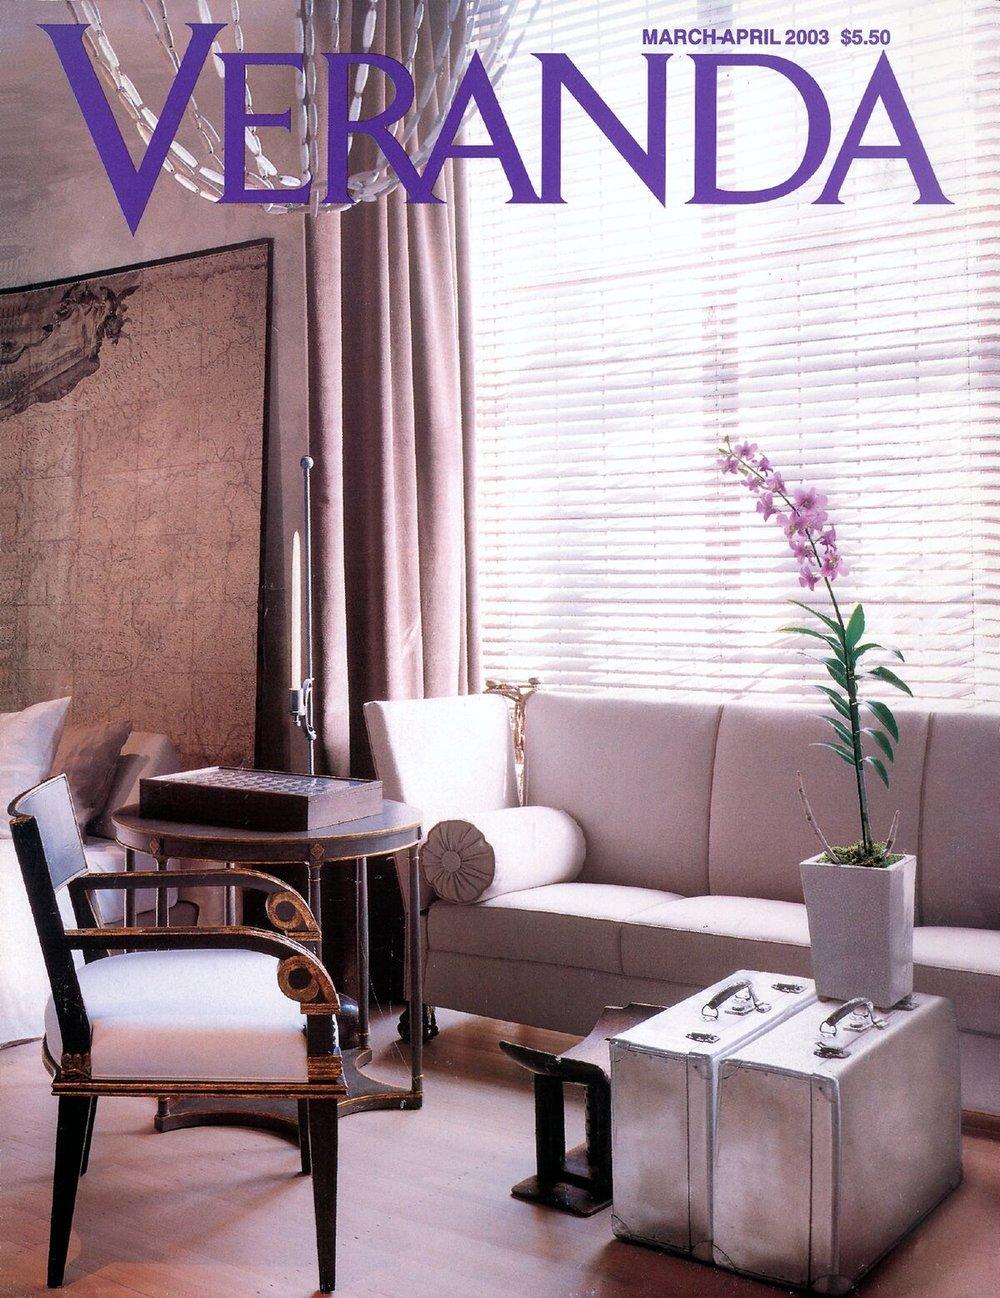 Dreamy Classic Comfort - Published in Veranda, March-April 2003